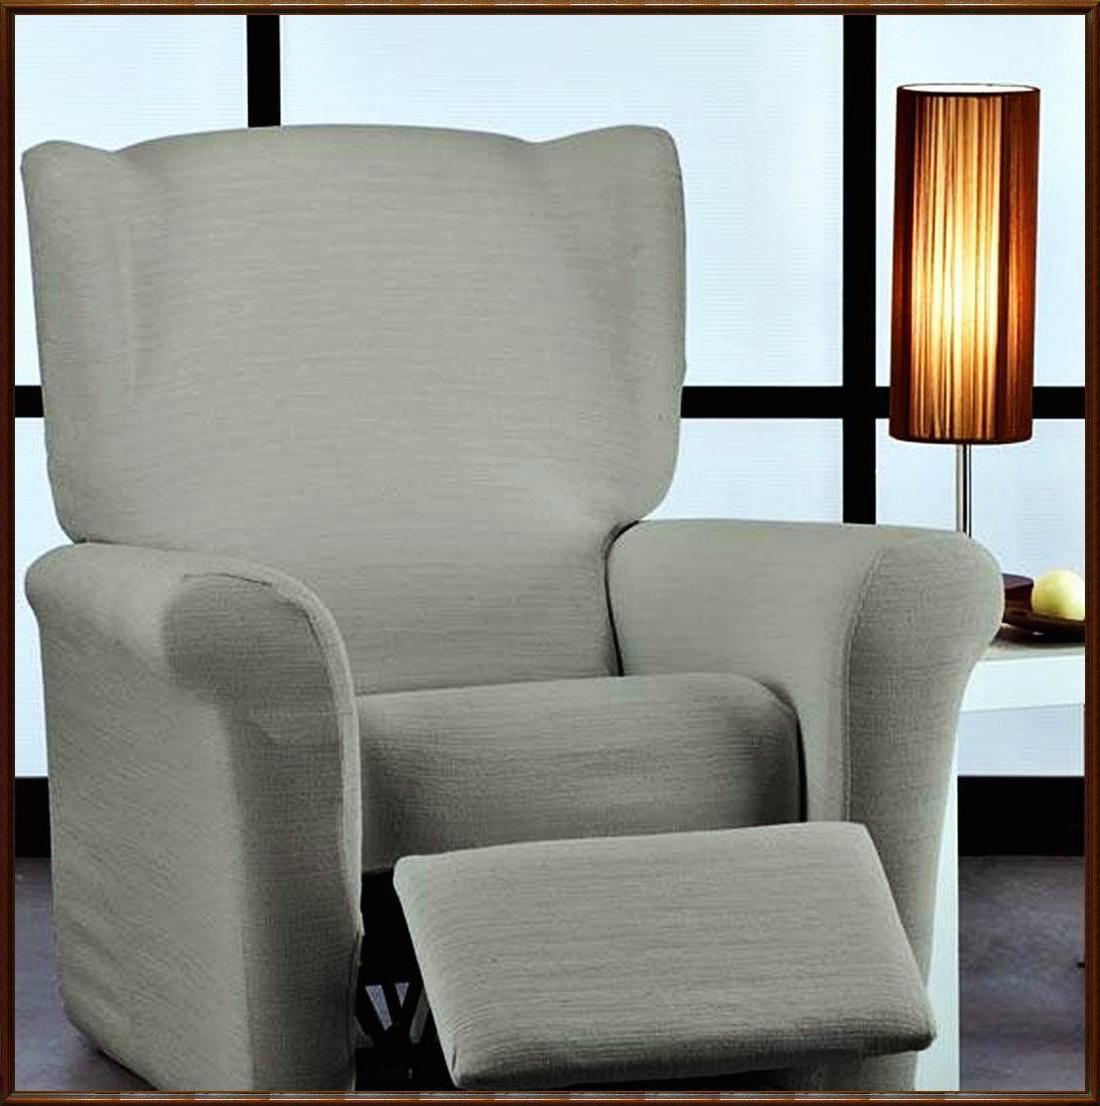 Sillon Relax Ikea Bqdd Ikea Sillones Relax Ideas De Decoracià N Casera